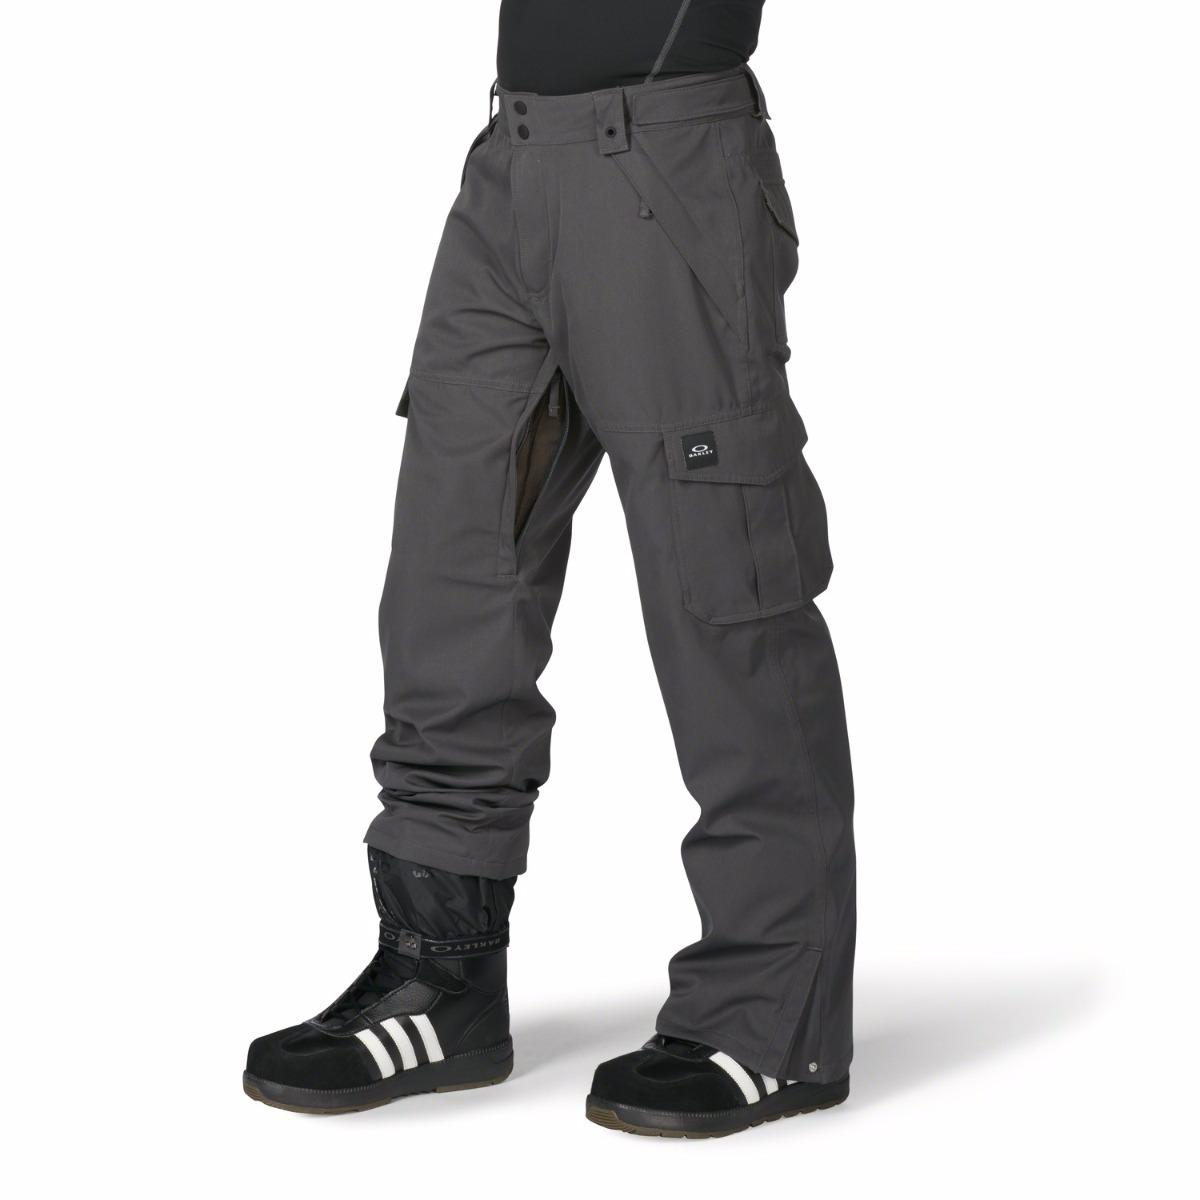 Ski Snowboard Pantalon Talle Oakley 4 000 S Arrowhead En 00 CdaHwxwp